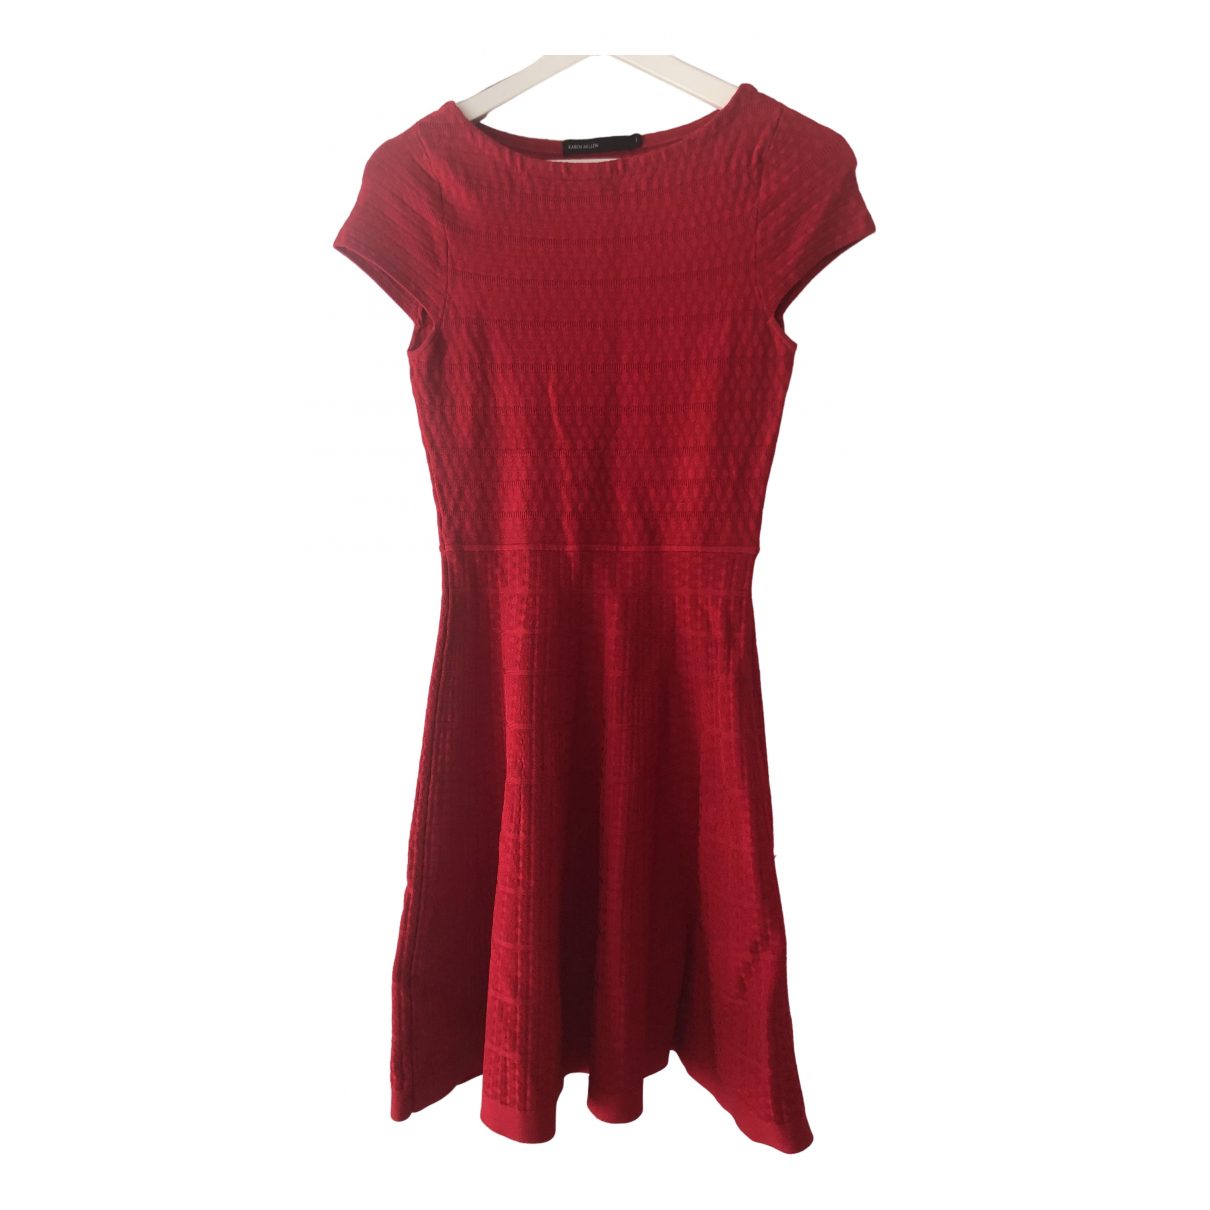 Karen Millen \N Kleid in  Rot Viskose